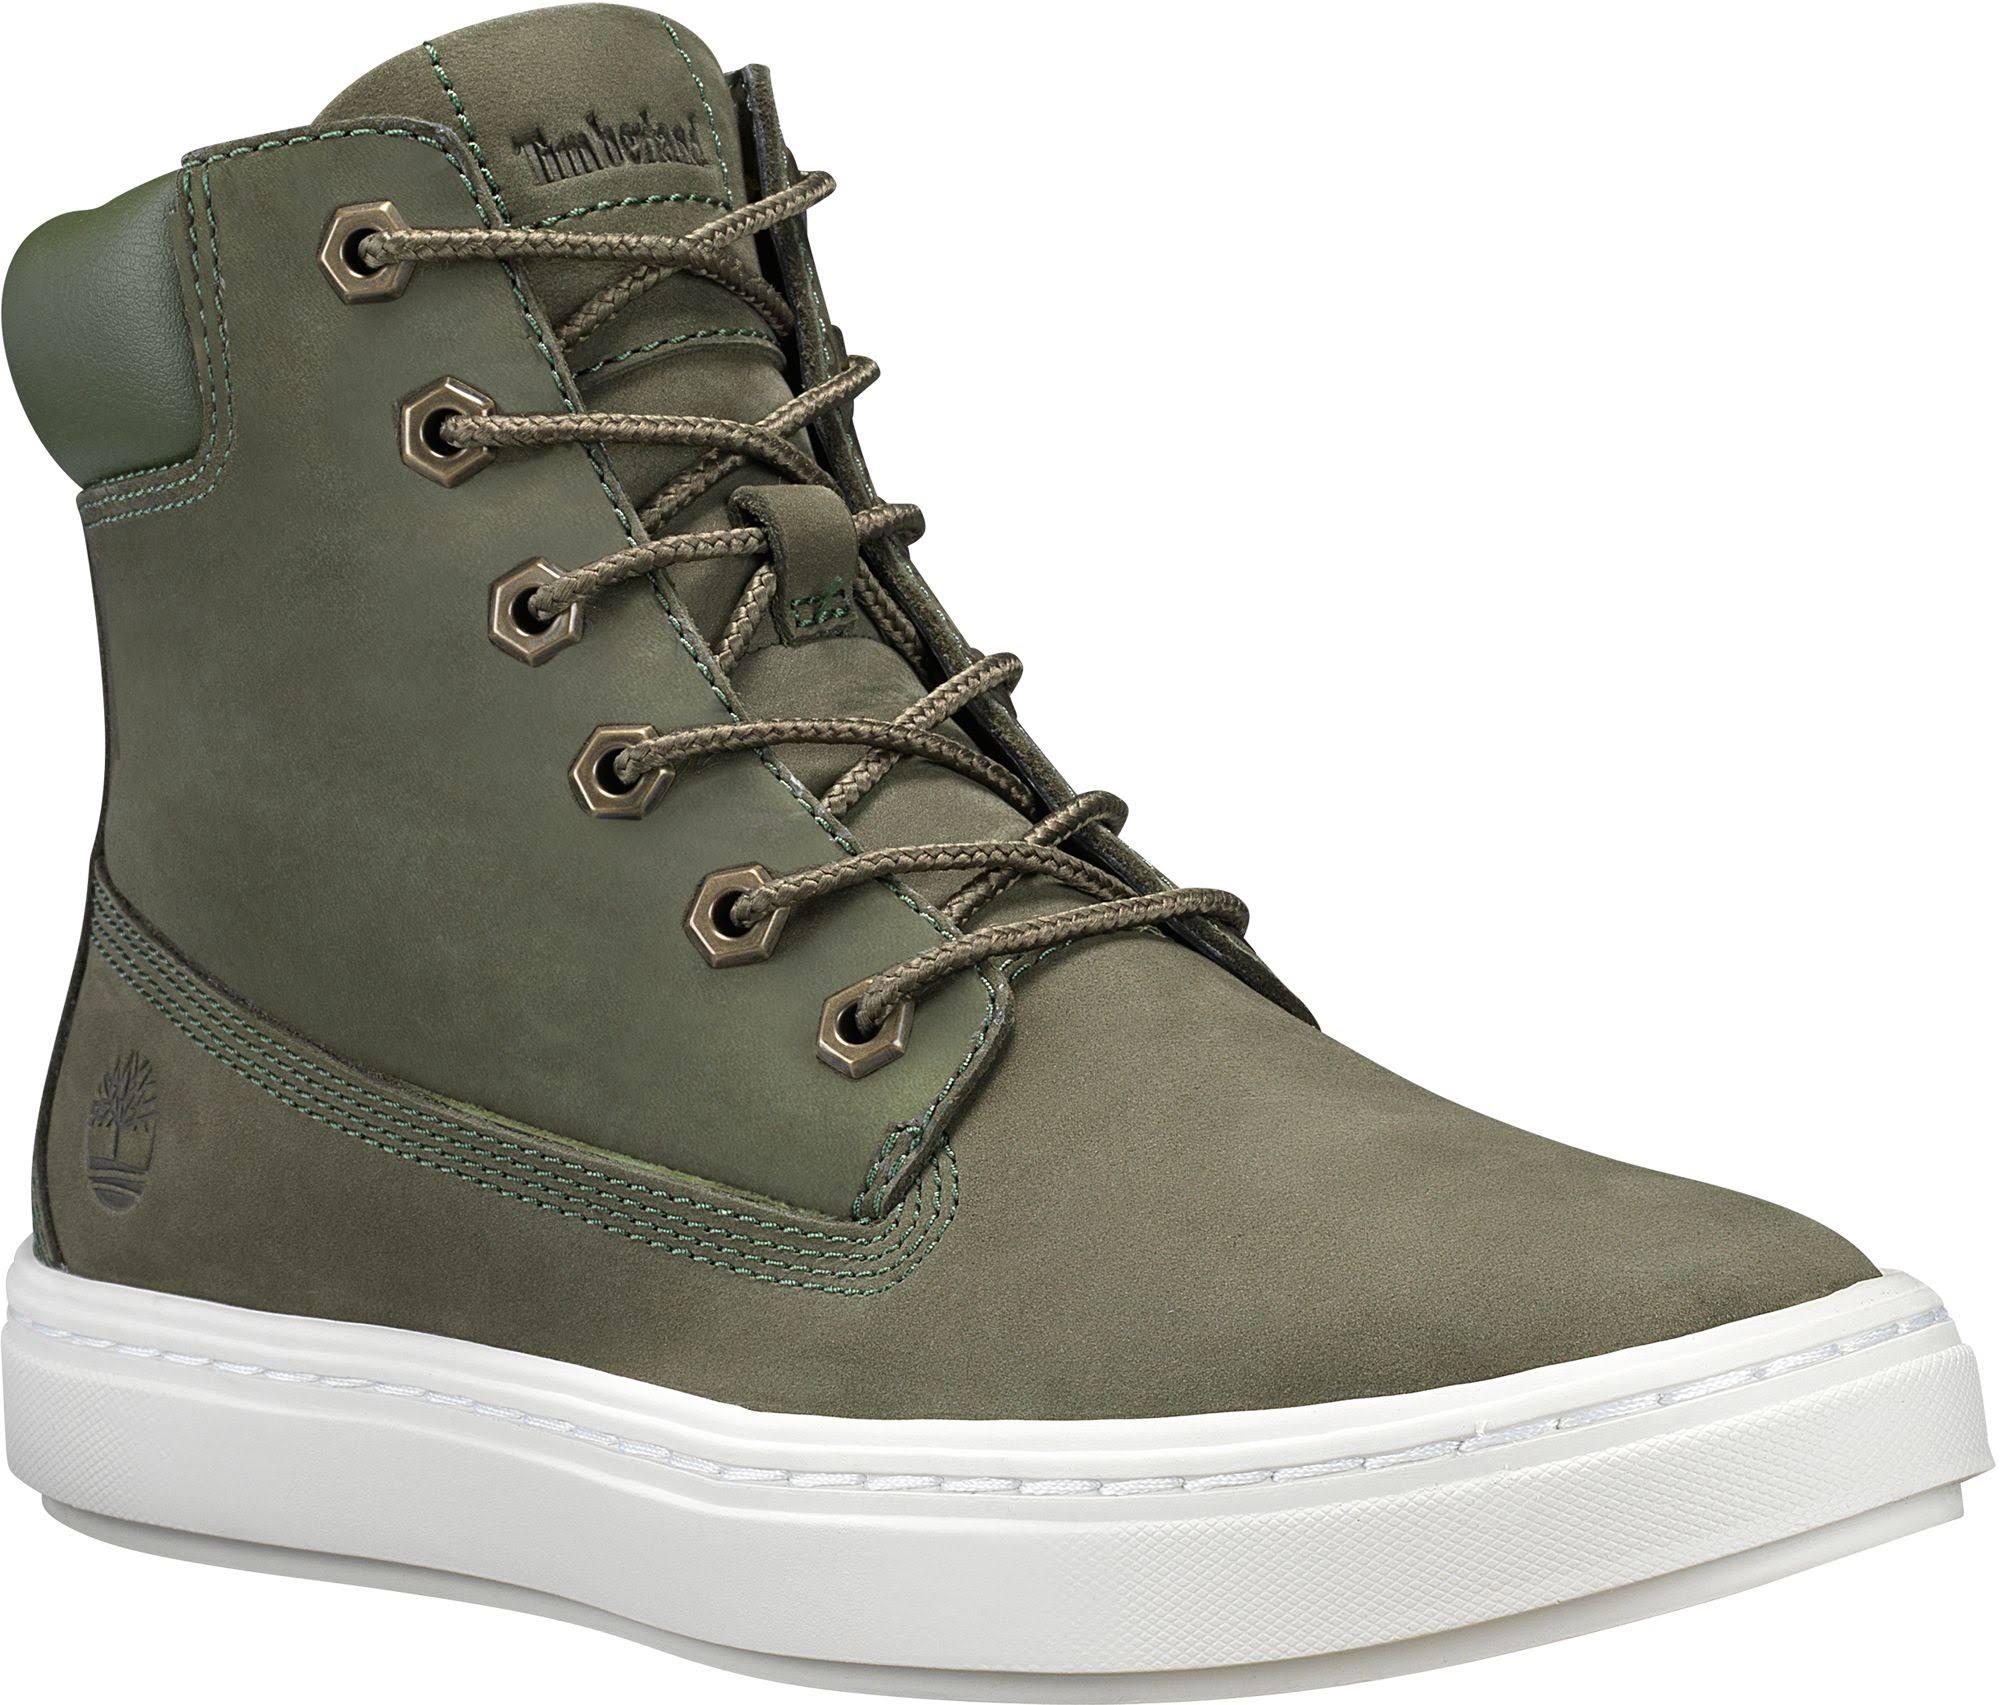 Boots Green Size Timberland B 6 7 Womens Londyn Inch CwwItq